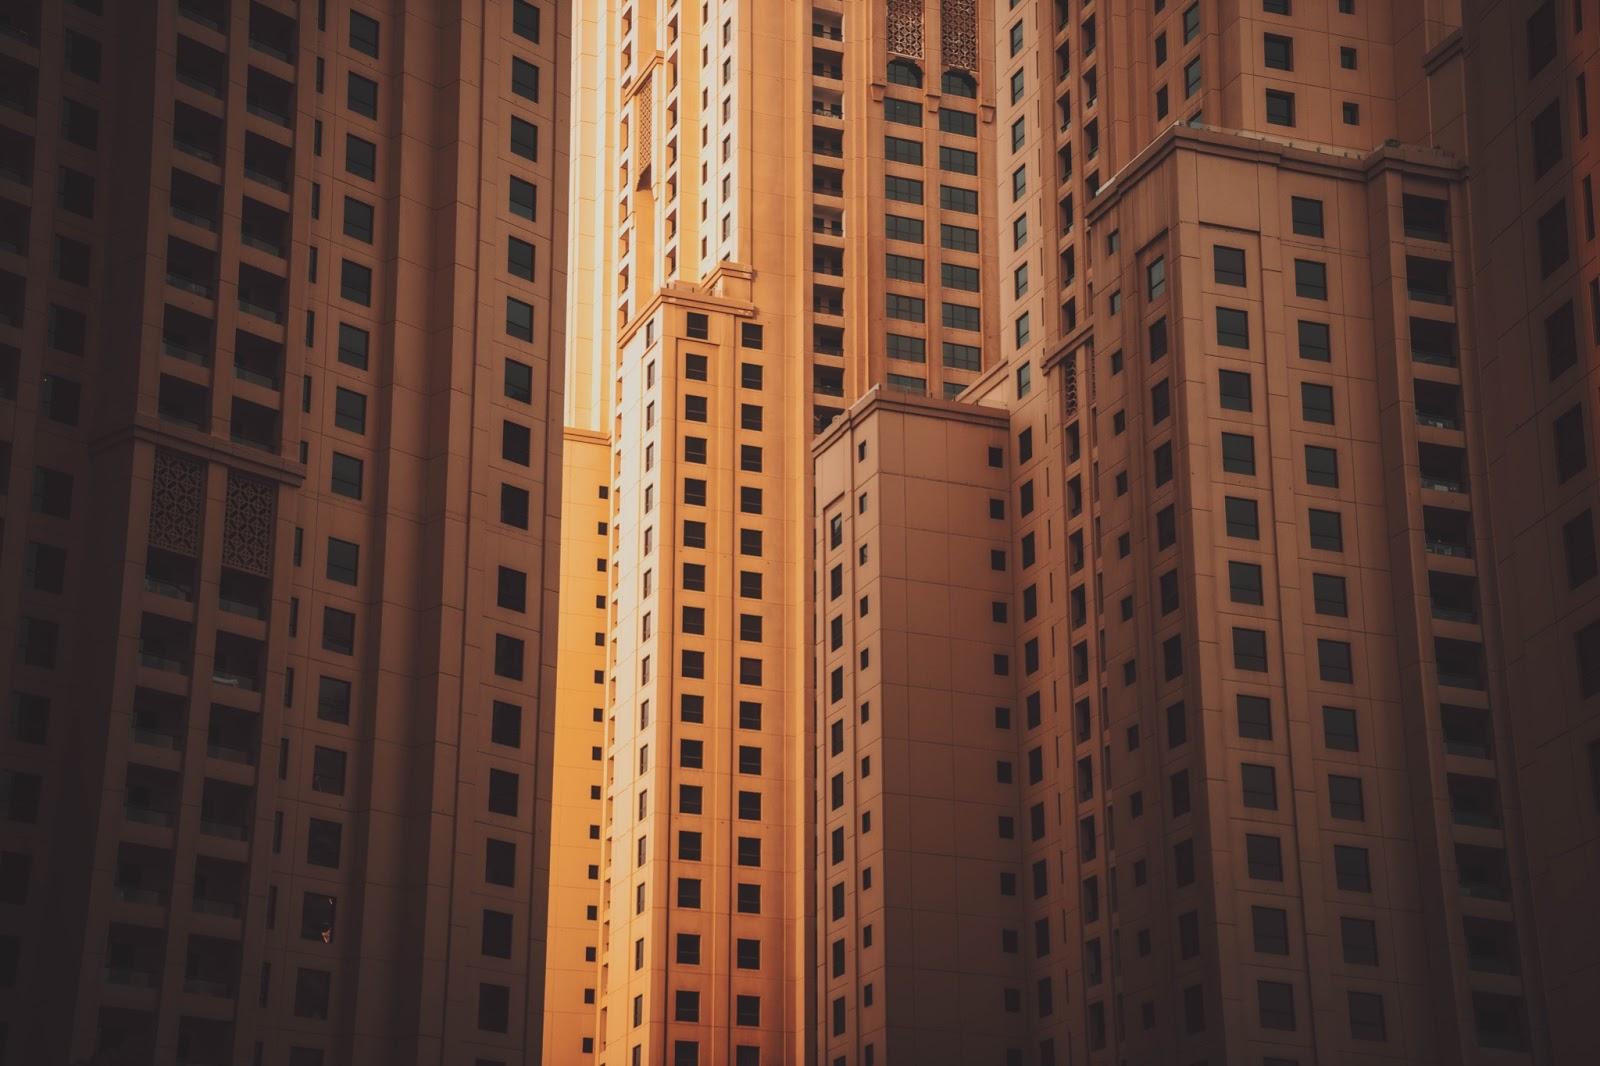 Big City Sky Scrapers